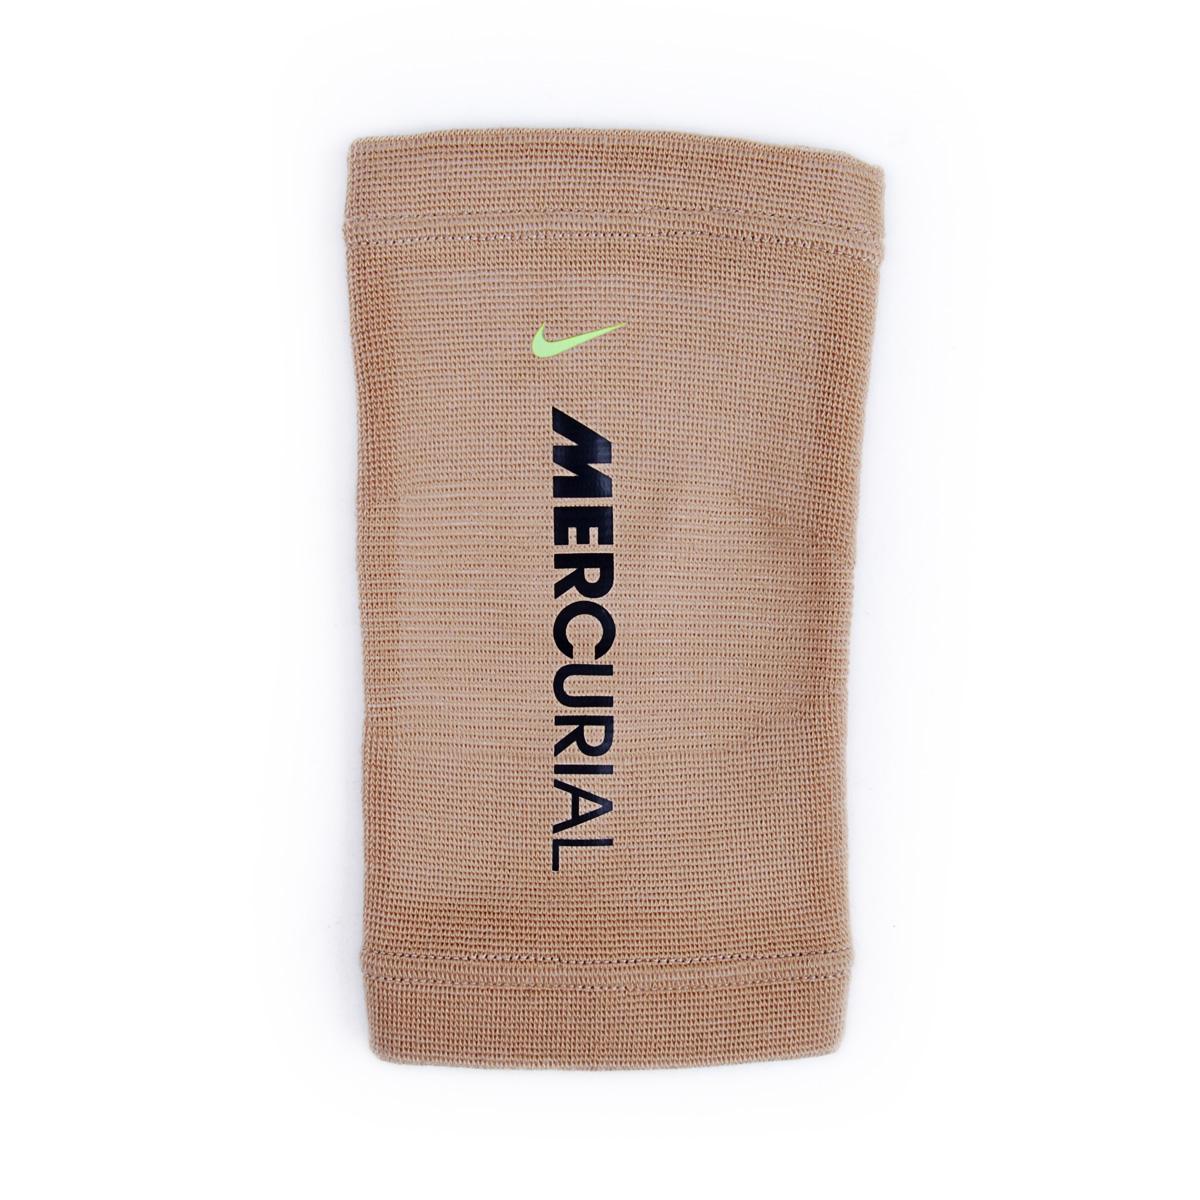 Fingerband Nike nike дорожка координационная nike accessories